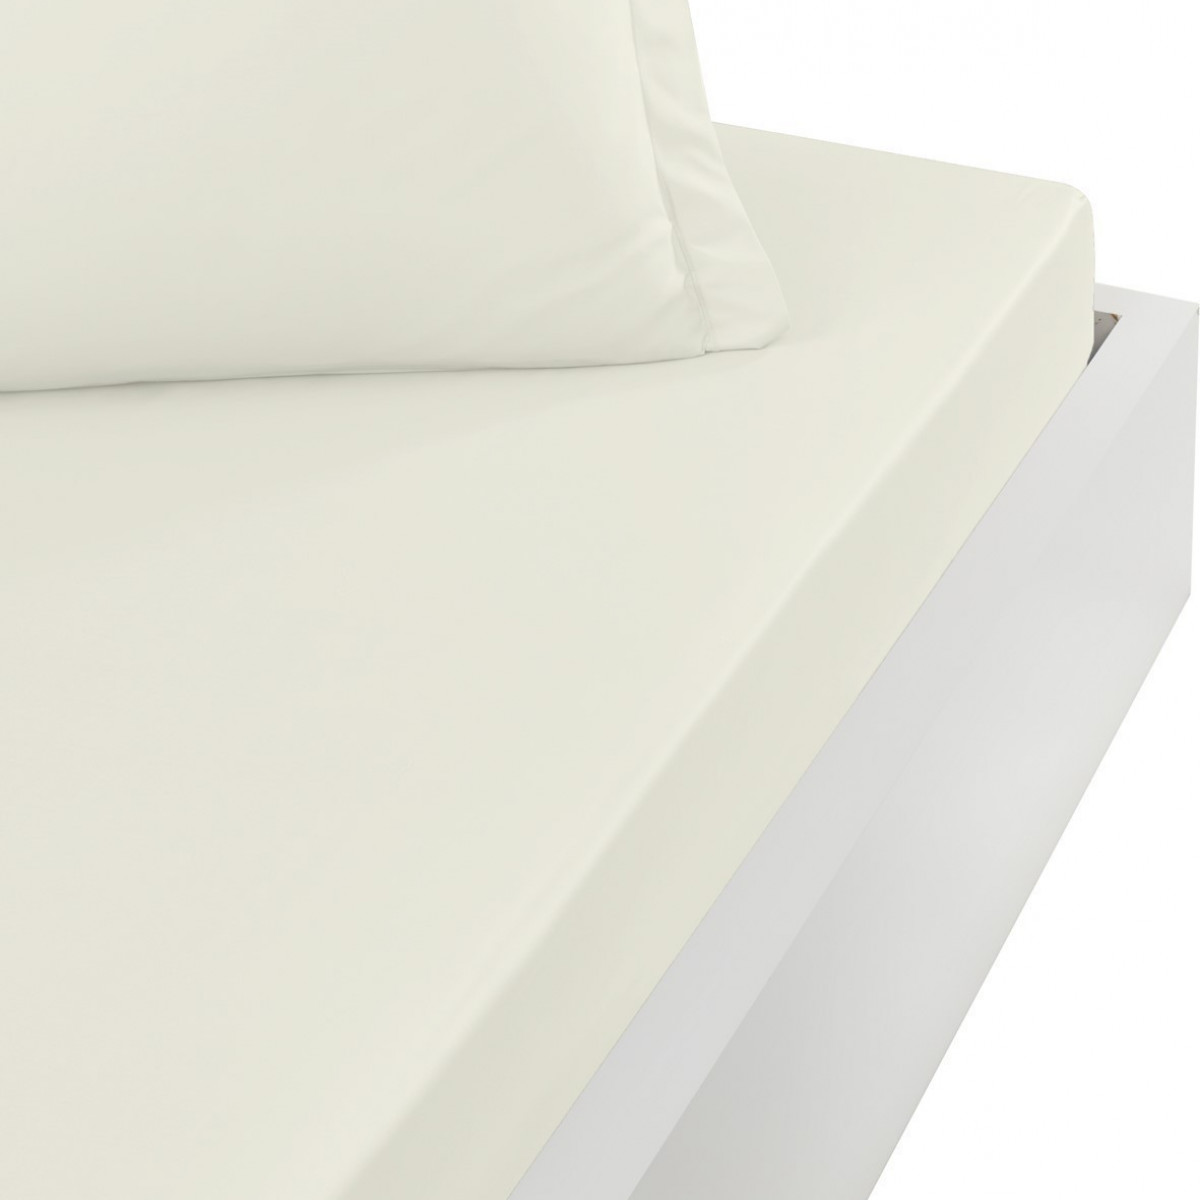 Drap housse en percale de coton bon Ecru 140x200 cm